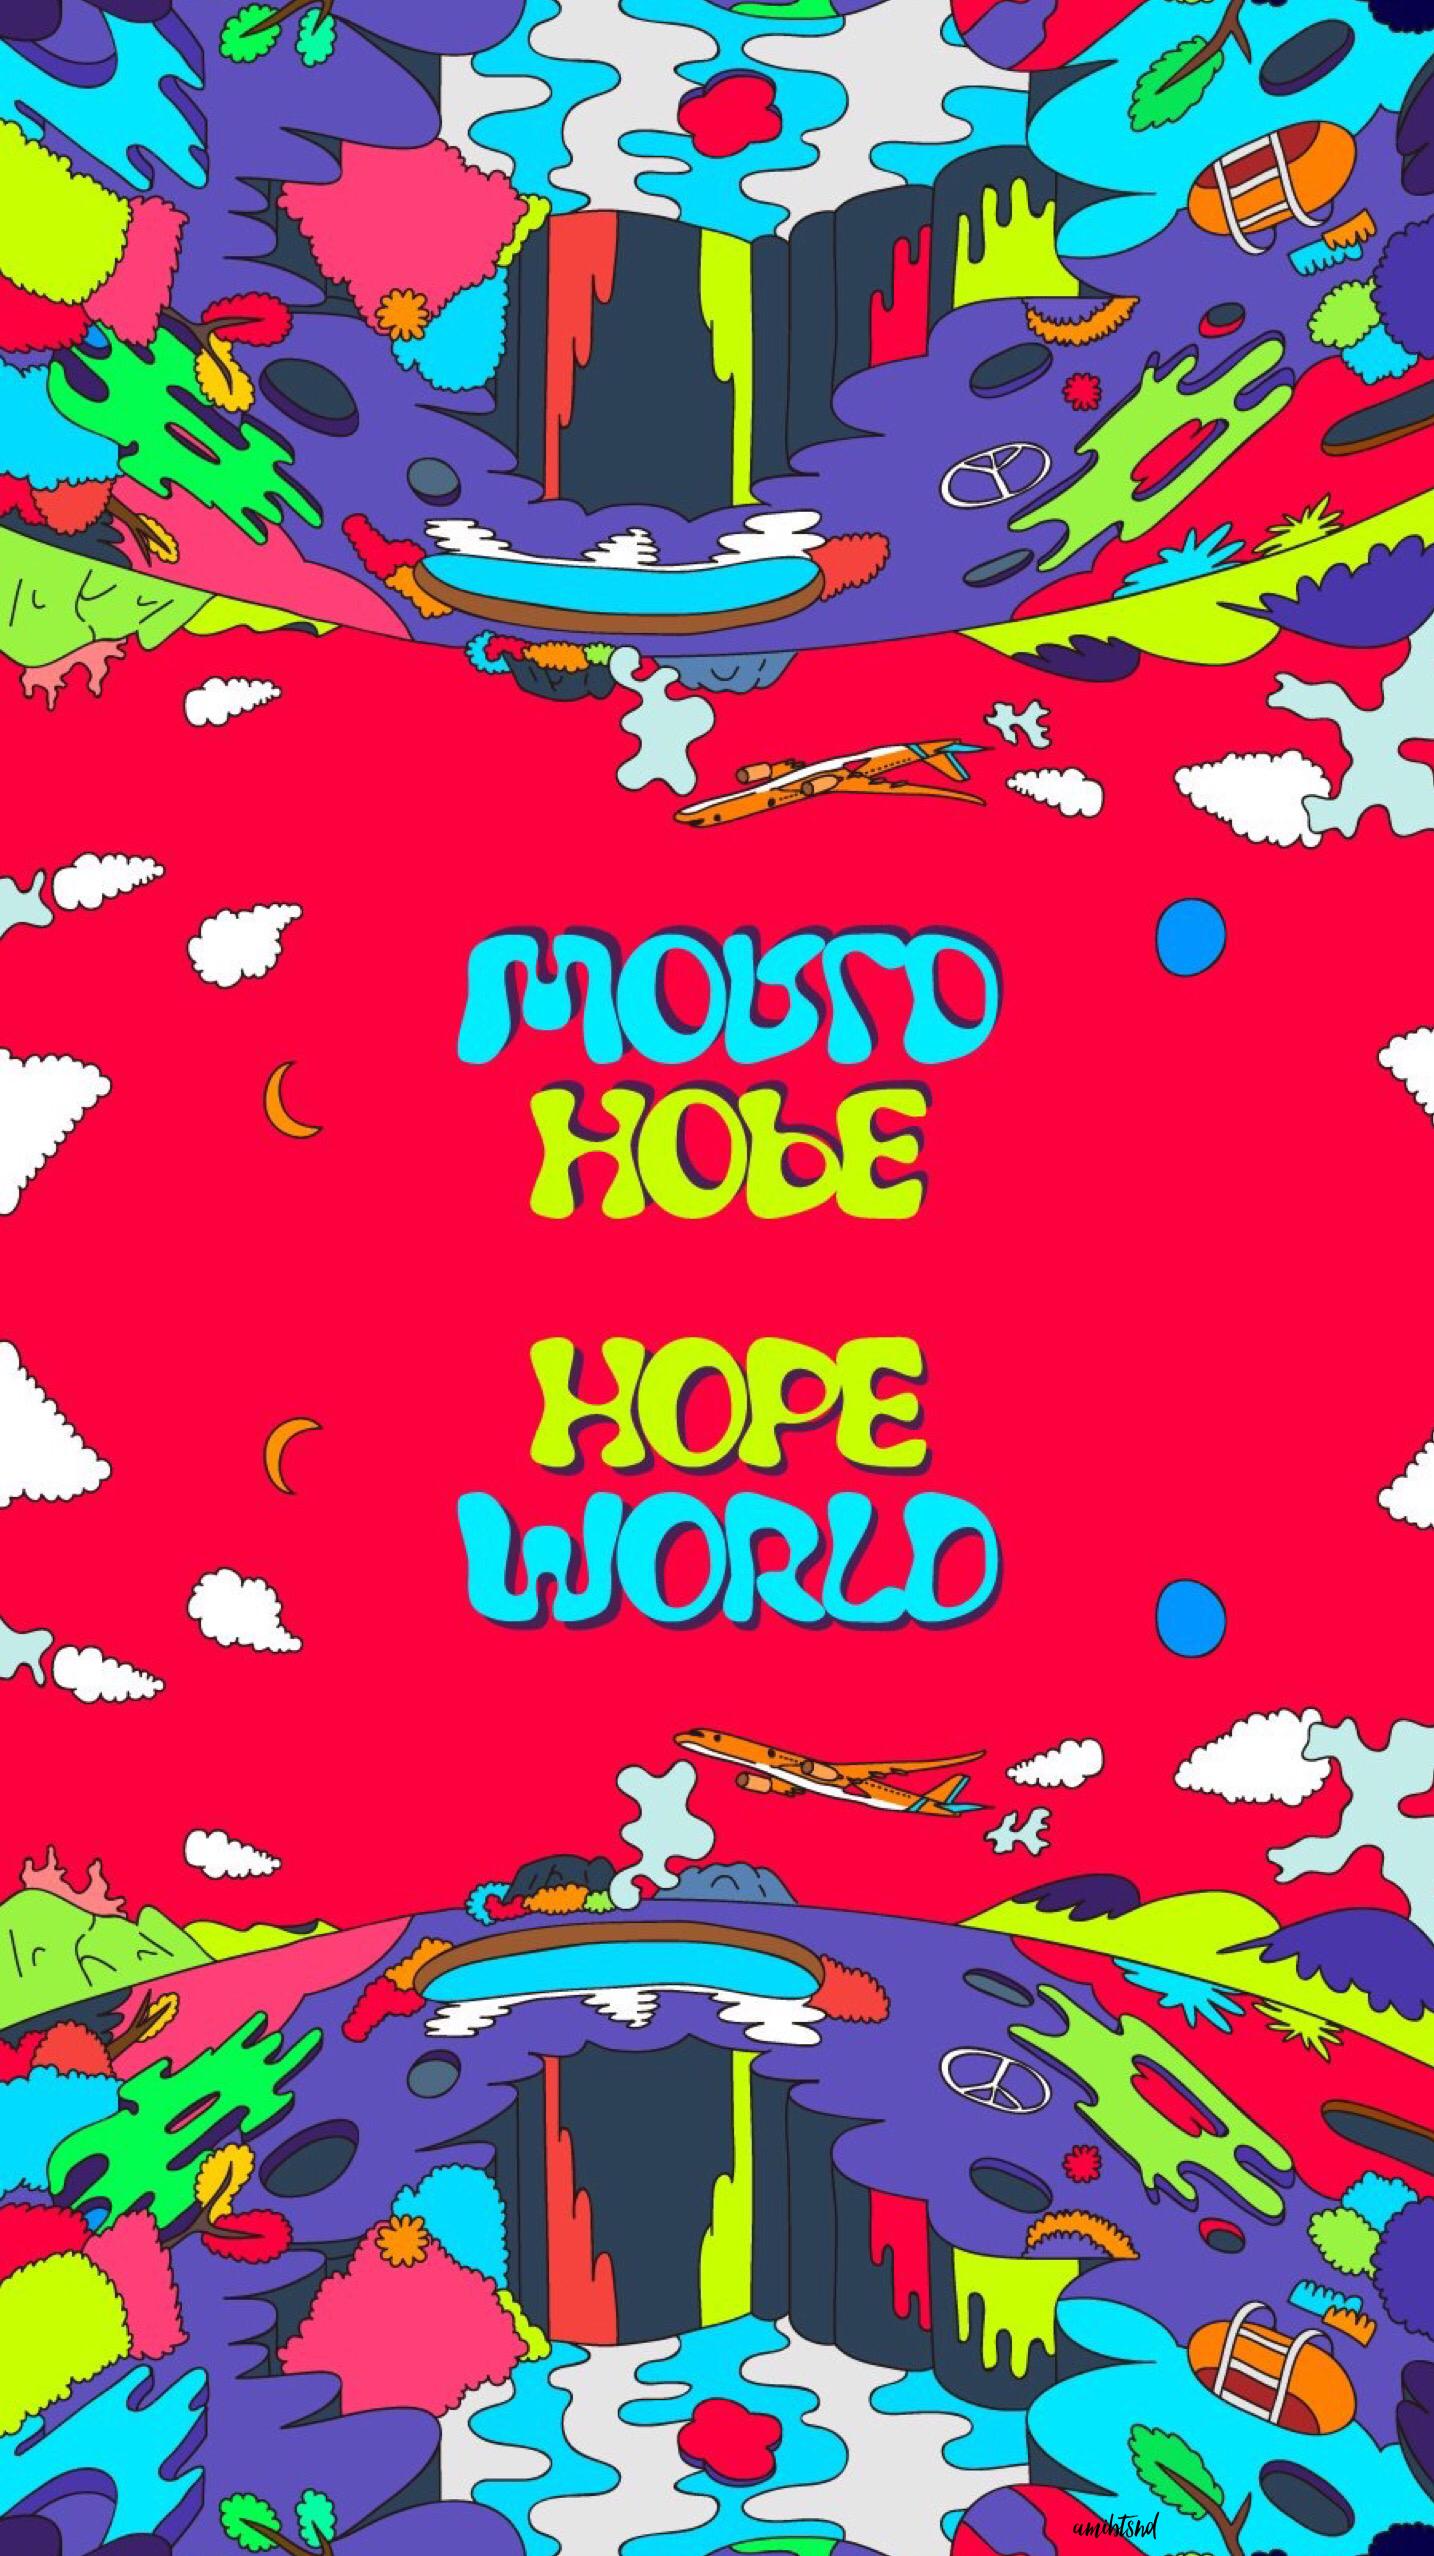 BTS WALLPAPER JHOPE JUNGHOSEOK HOPE WORLD | BTS in 2019